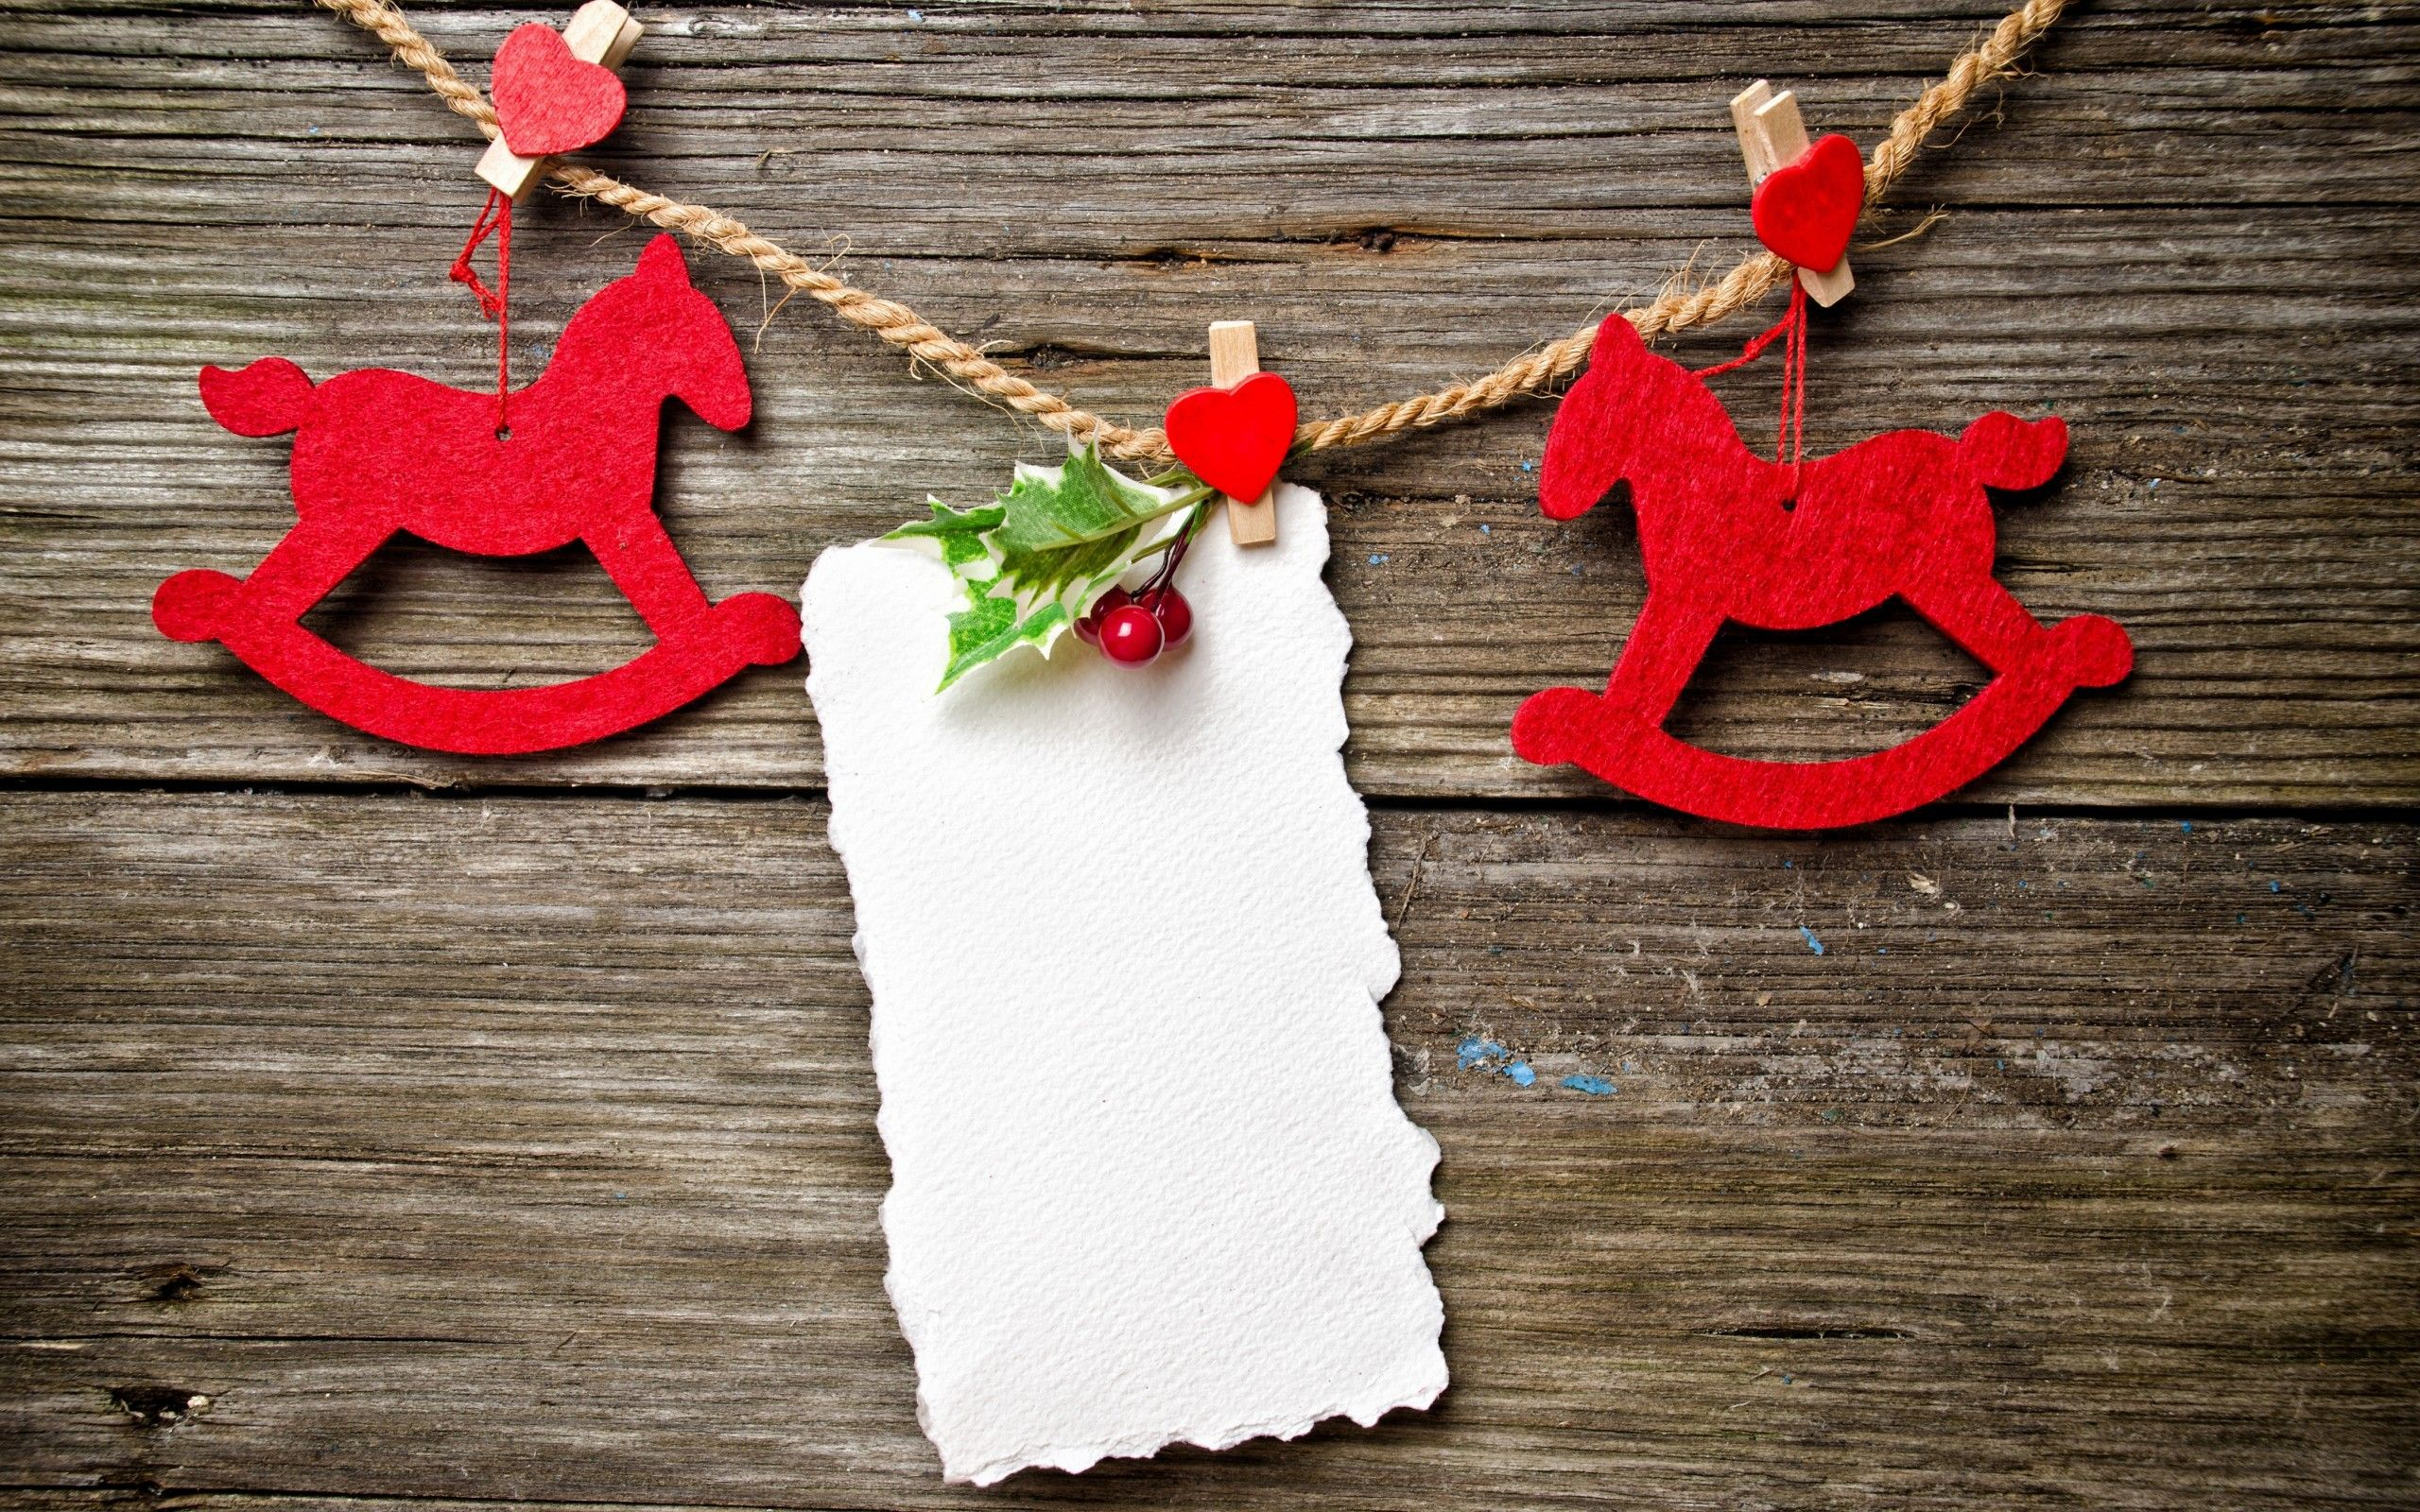 Most Inspiring Wallpaper Christmas Wood - 5ee22f86e17f40b41cc54412ee88edbc  HD_137255 .jpg